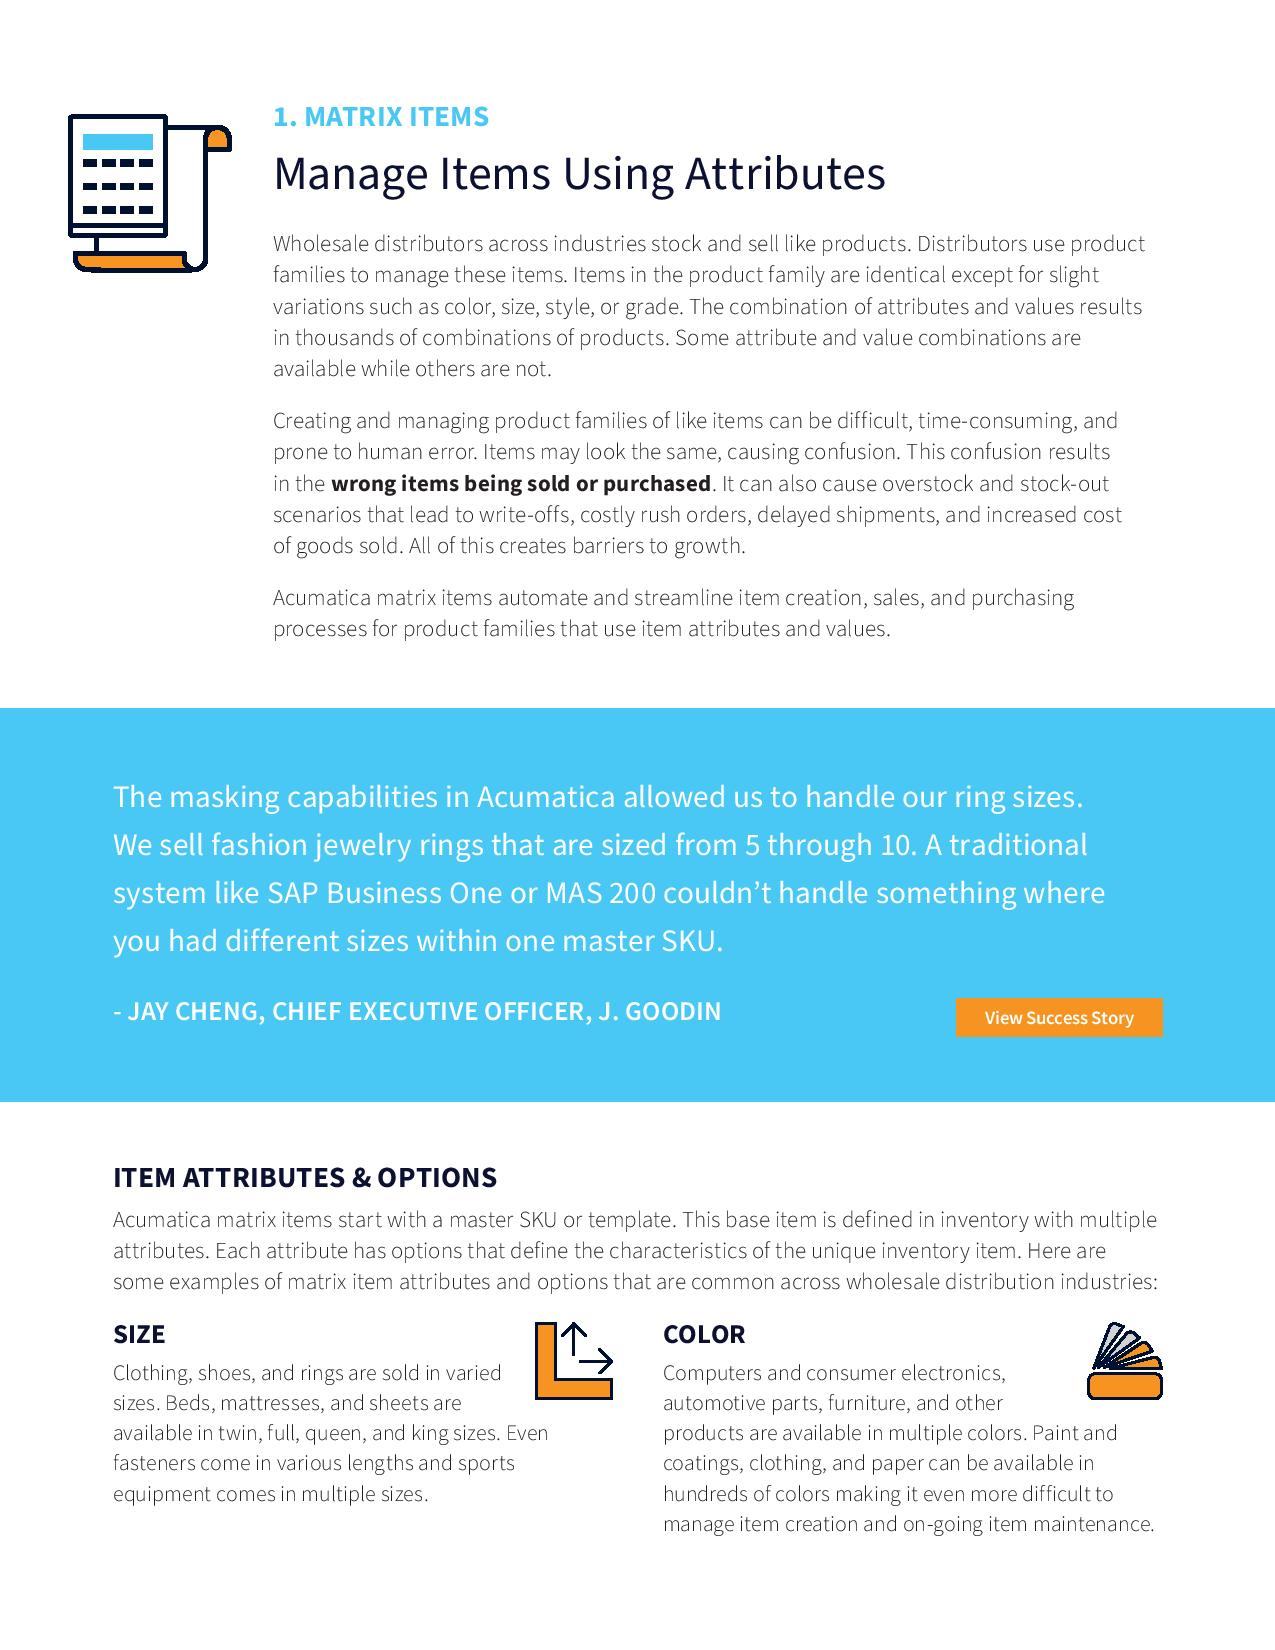 Faster, Easier Item Management for Distributors, page 1